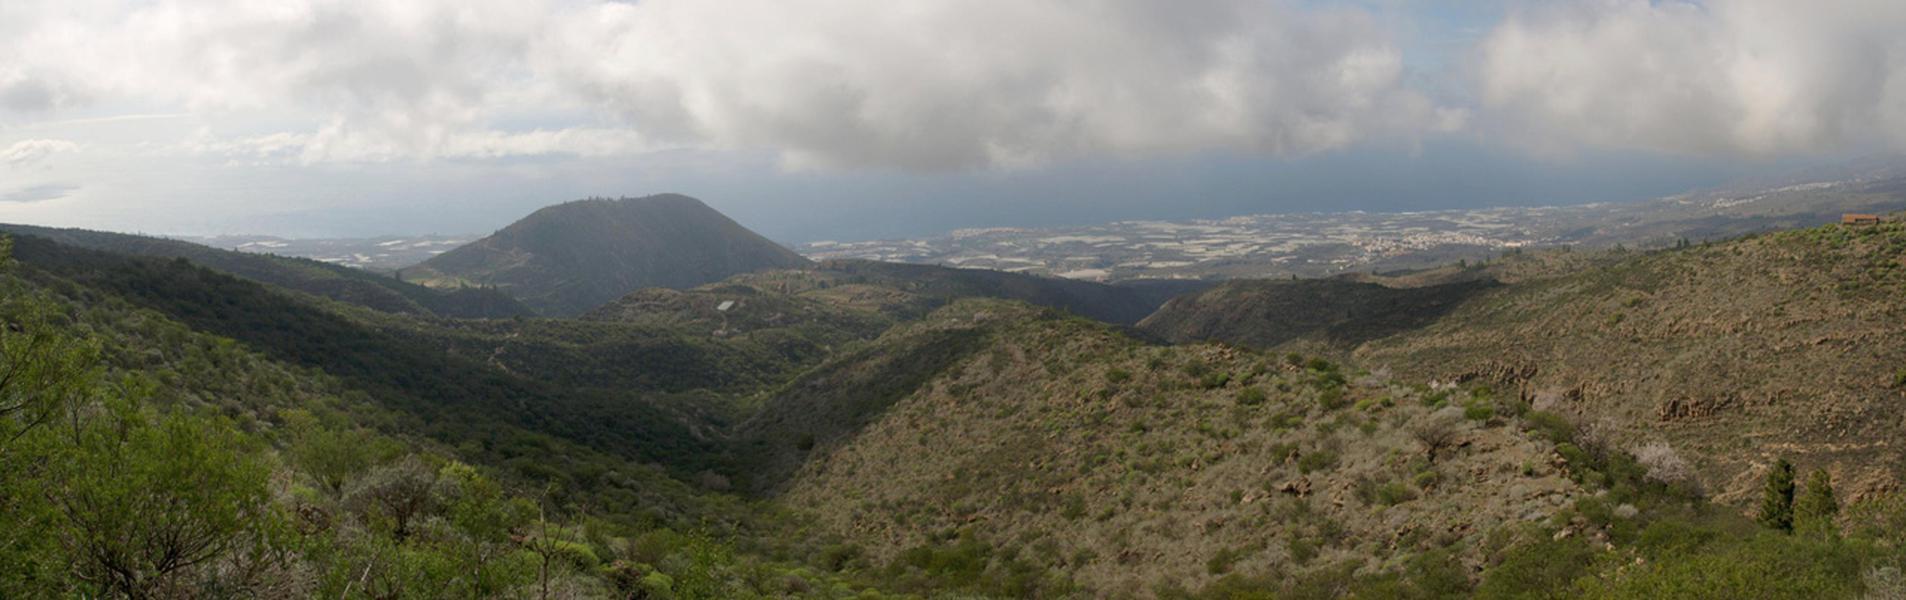 Montaña Tejina